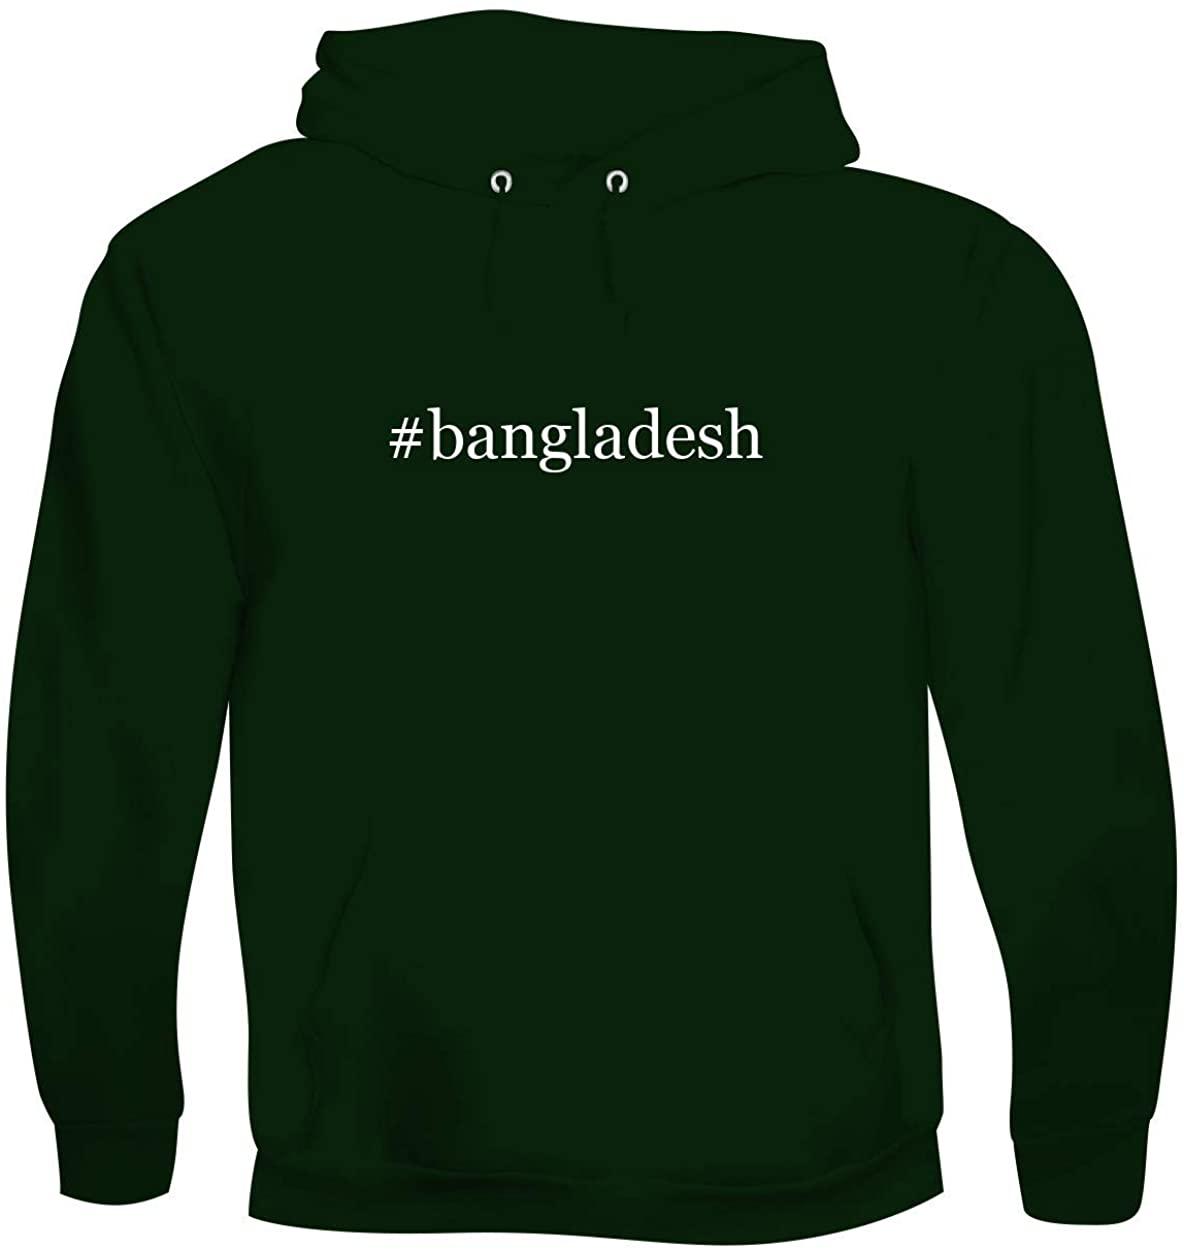 #bangladesh - Men's Hashtag Soft & Comfortable Hoodie Sweatshirt Pullover